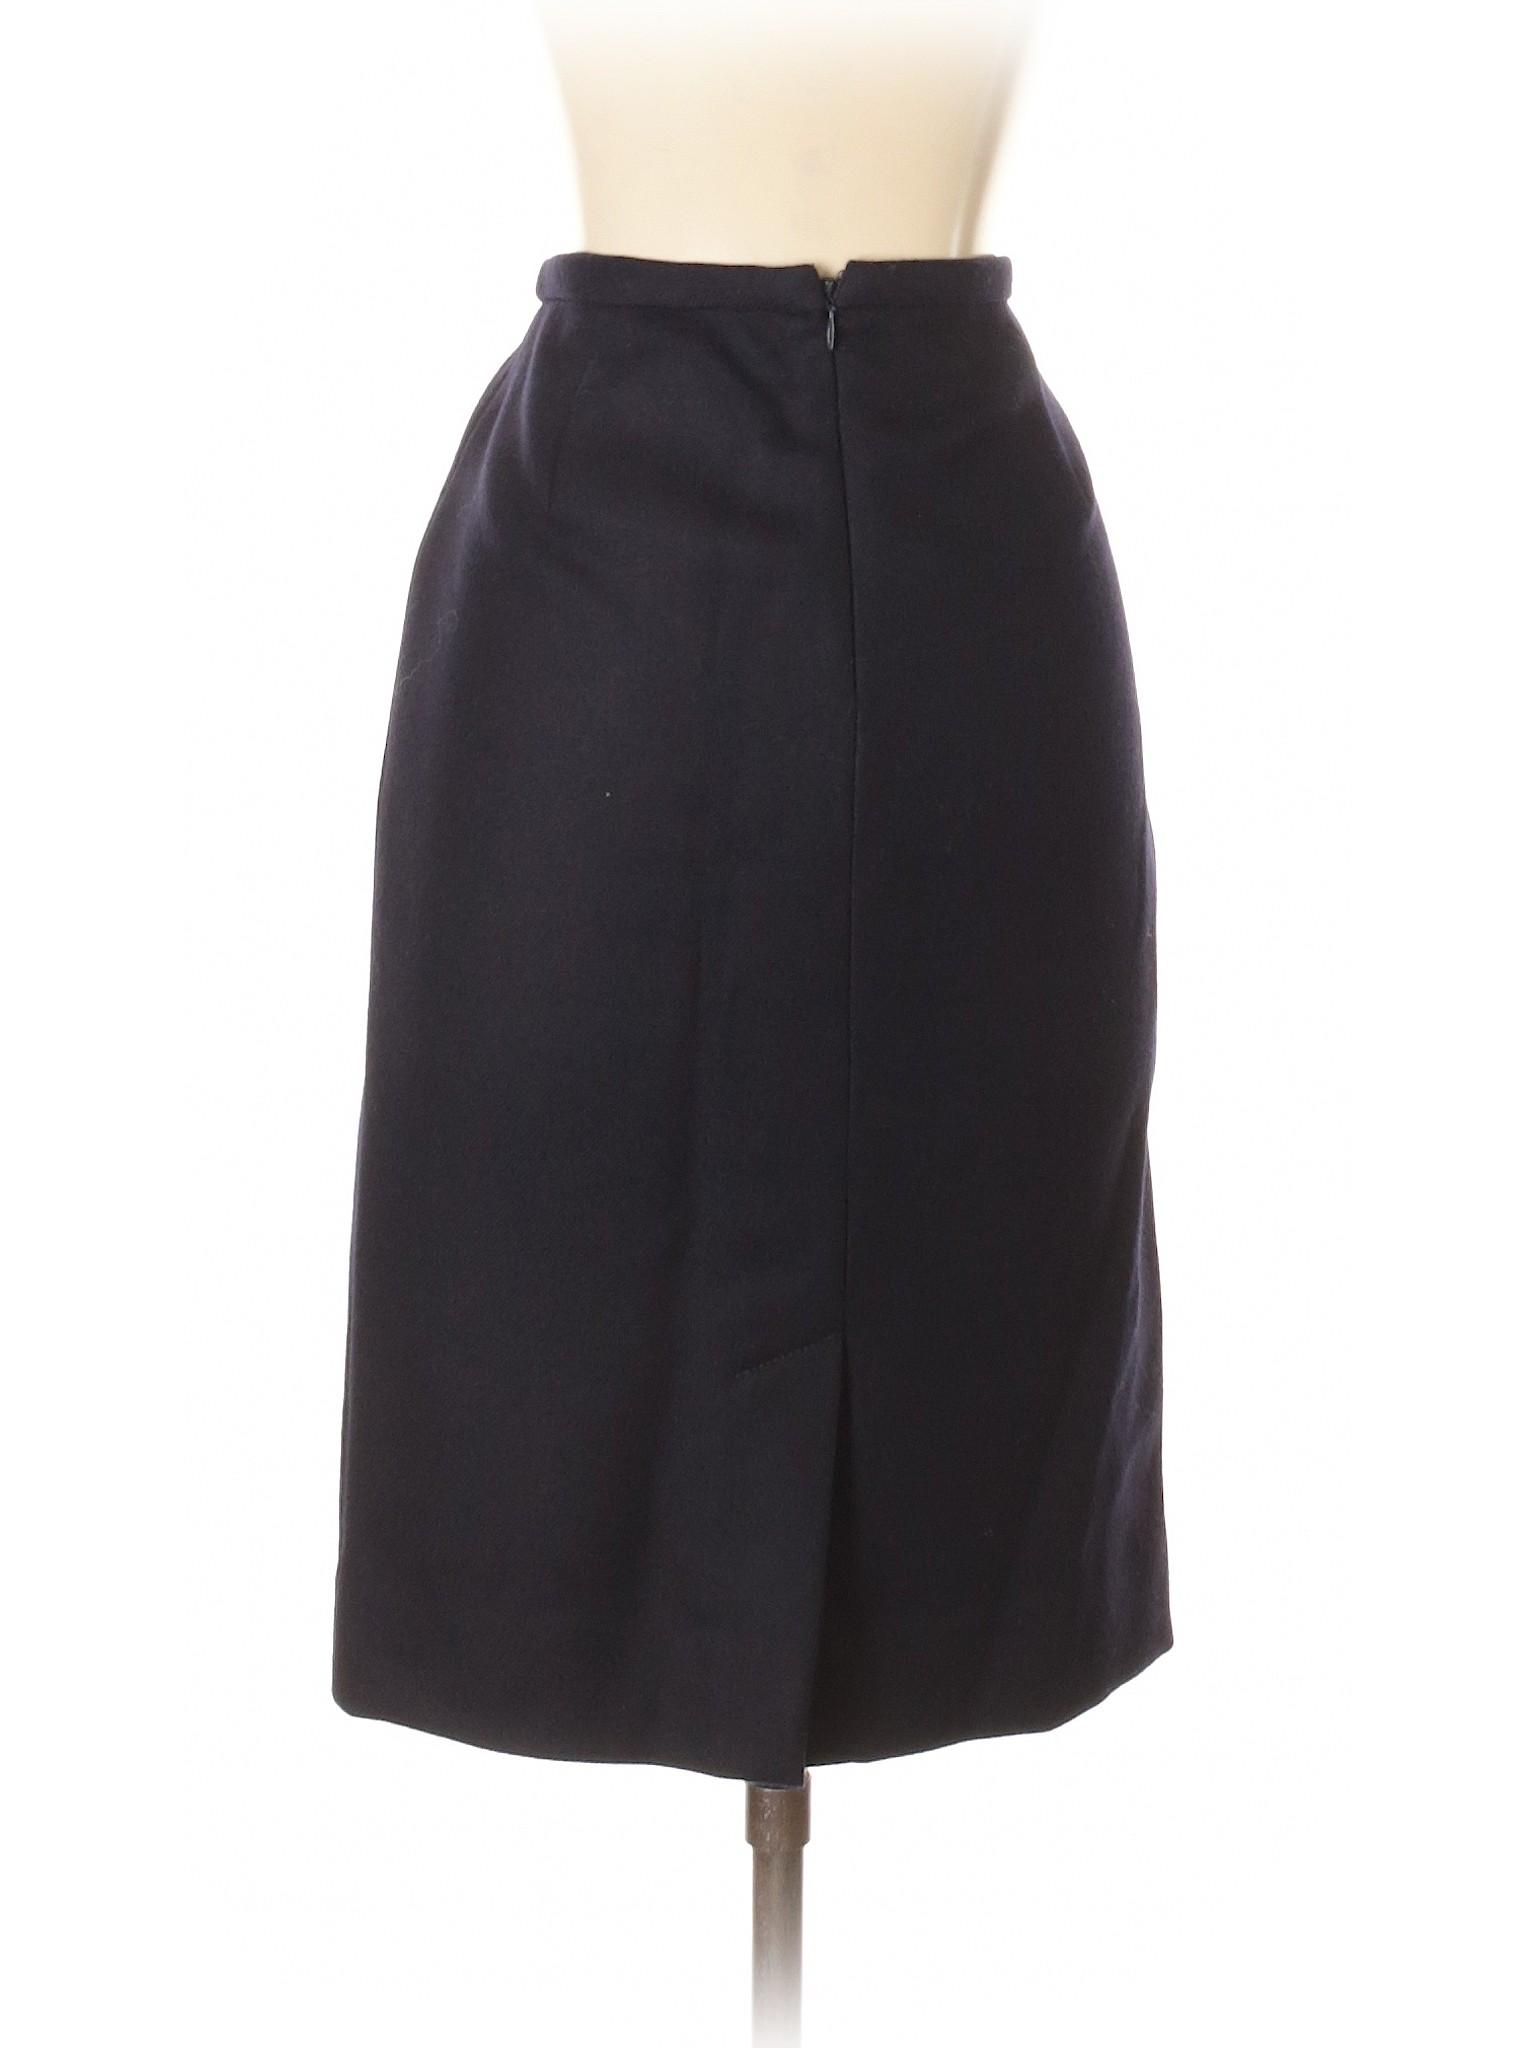 Winter Crew J Wool Leisure Skirt Yw8Hdfdx